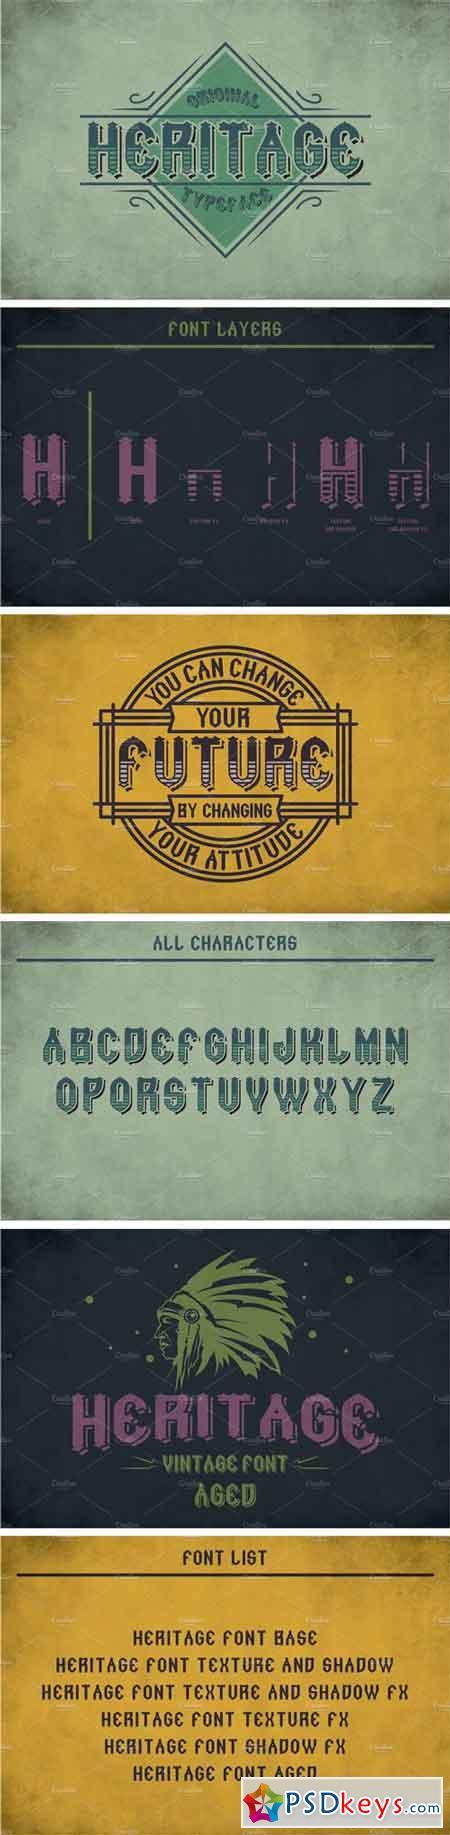 Heritage Vintage Label Typeface 2268543